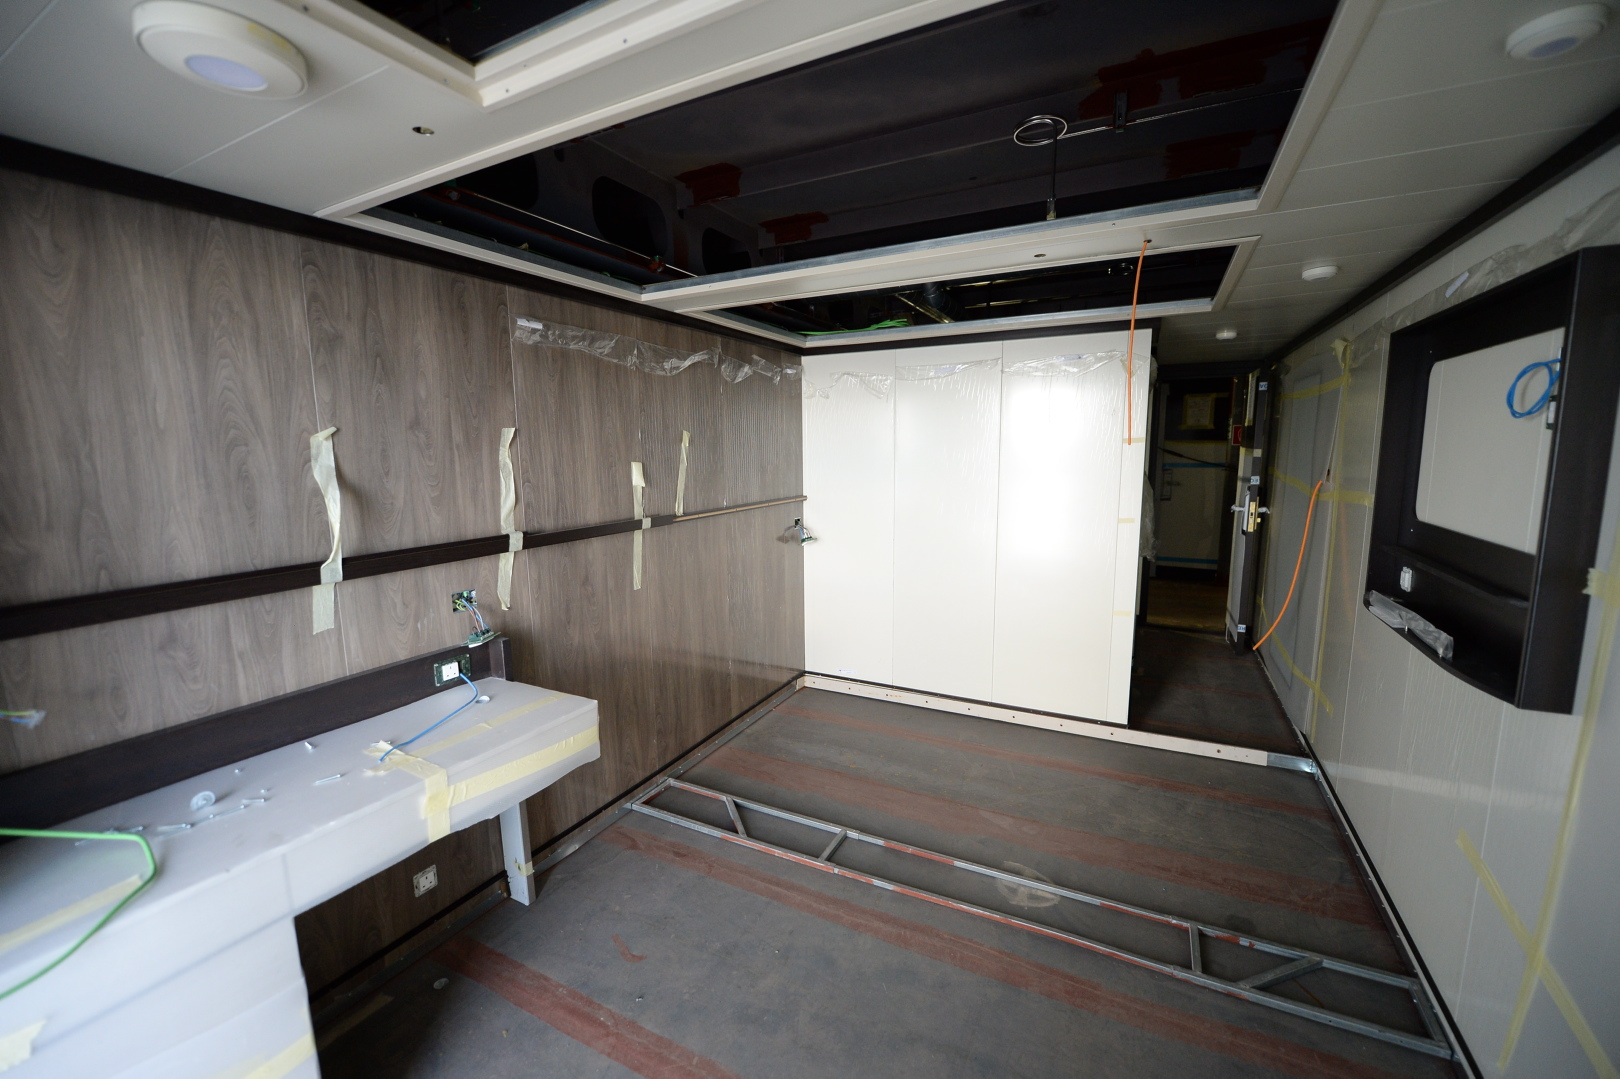 P o cruises britannia construction so far cruisemiss for P o britannia dining rooms